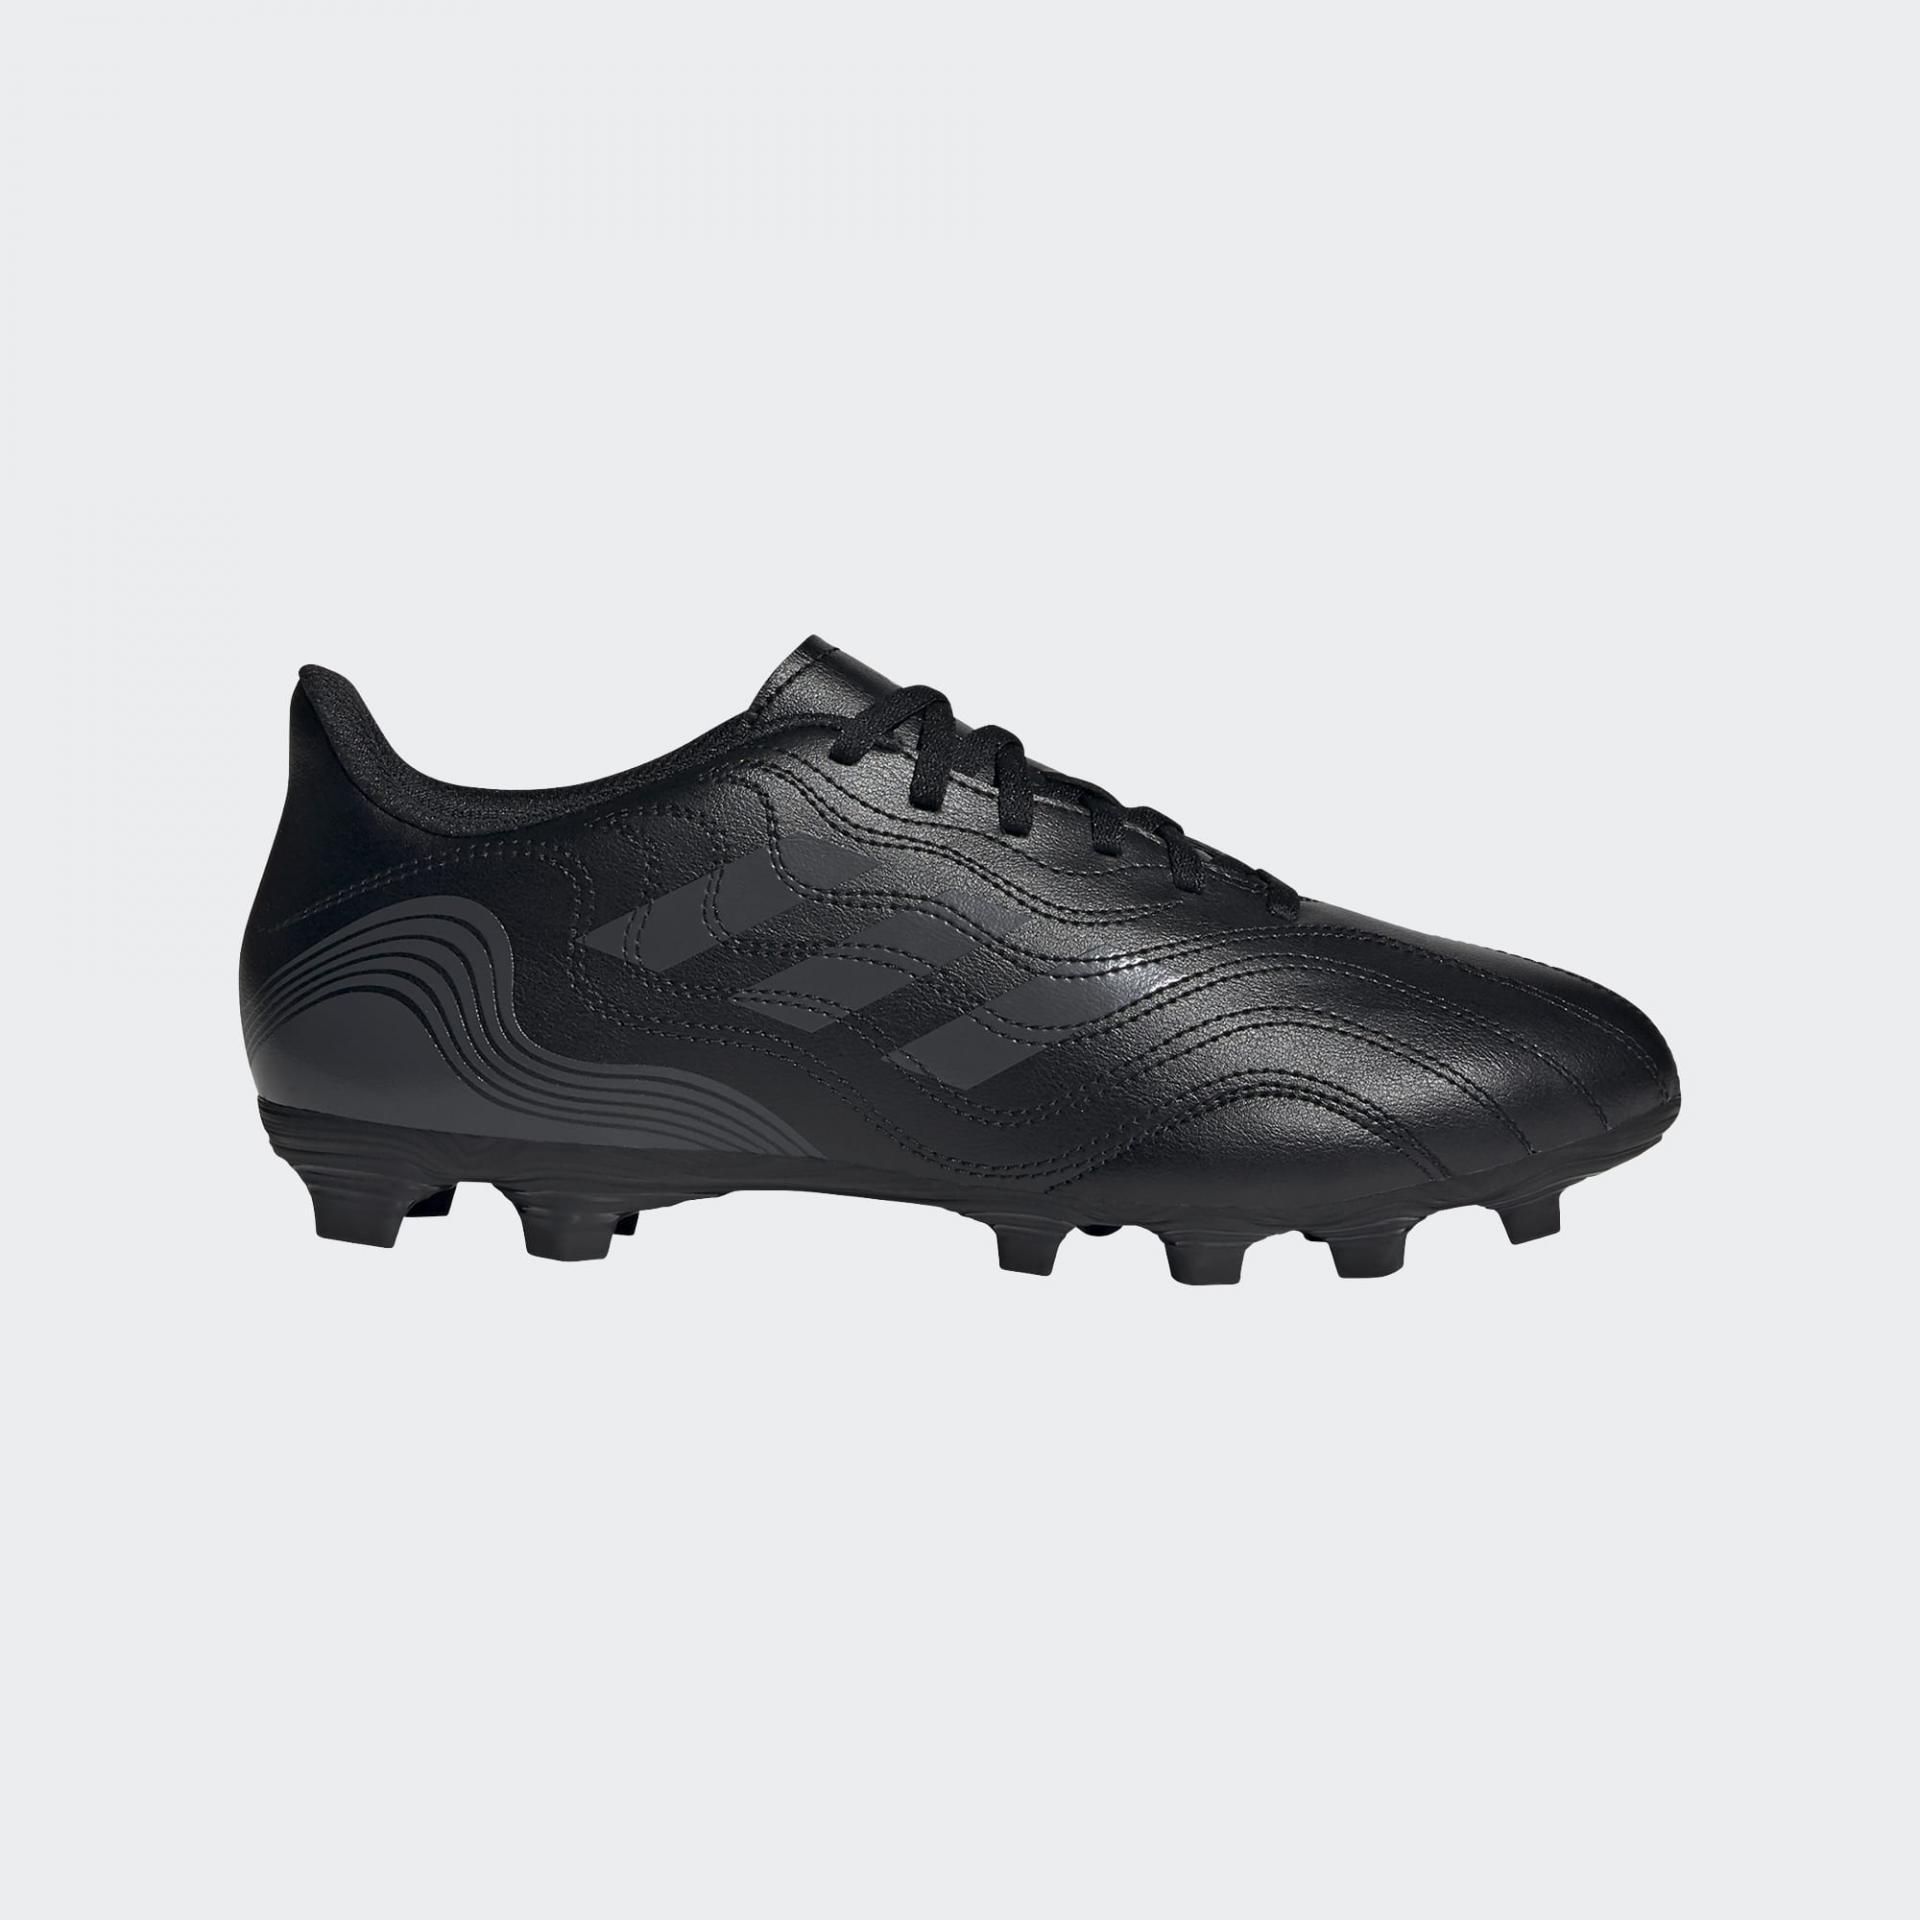 Bota de futbol Adidas FW6537 COPA SENSE.4